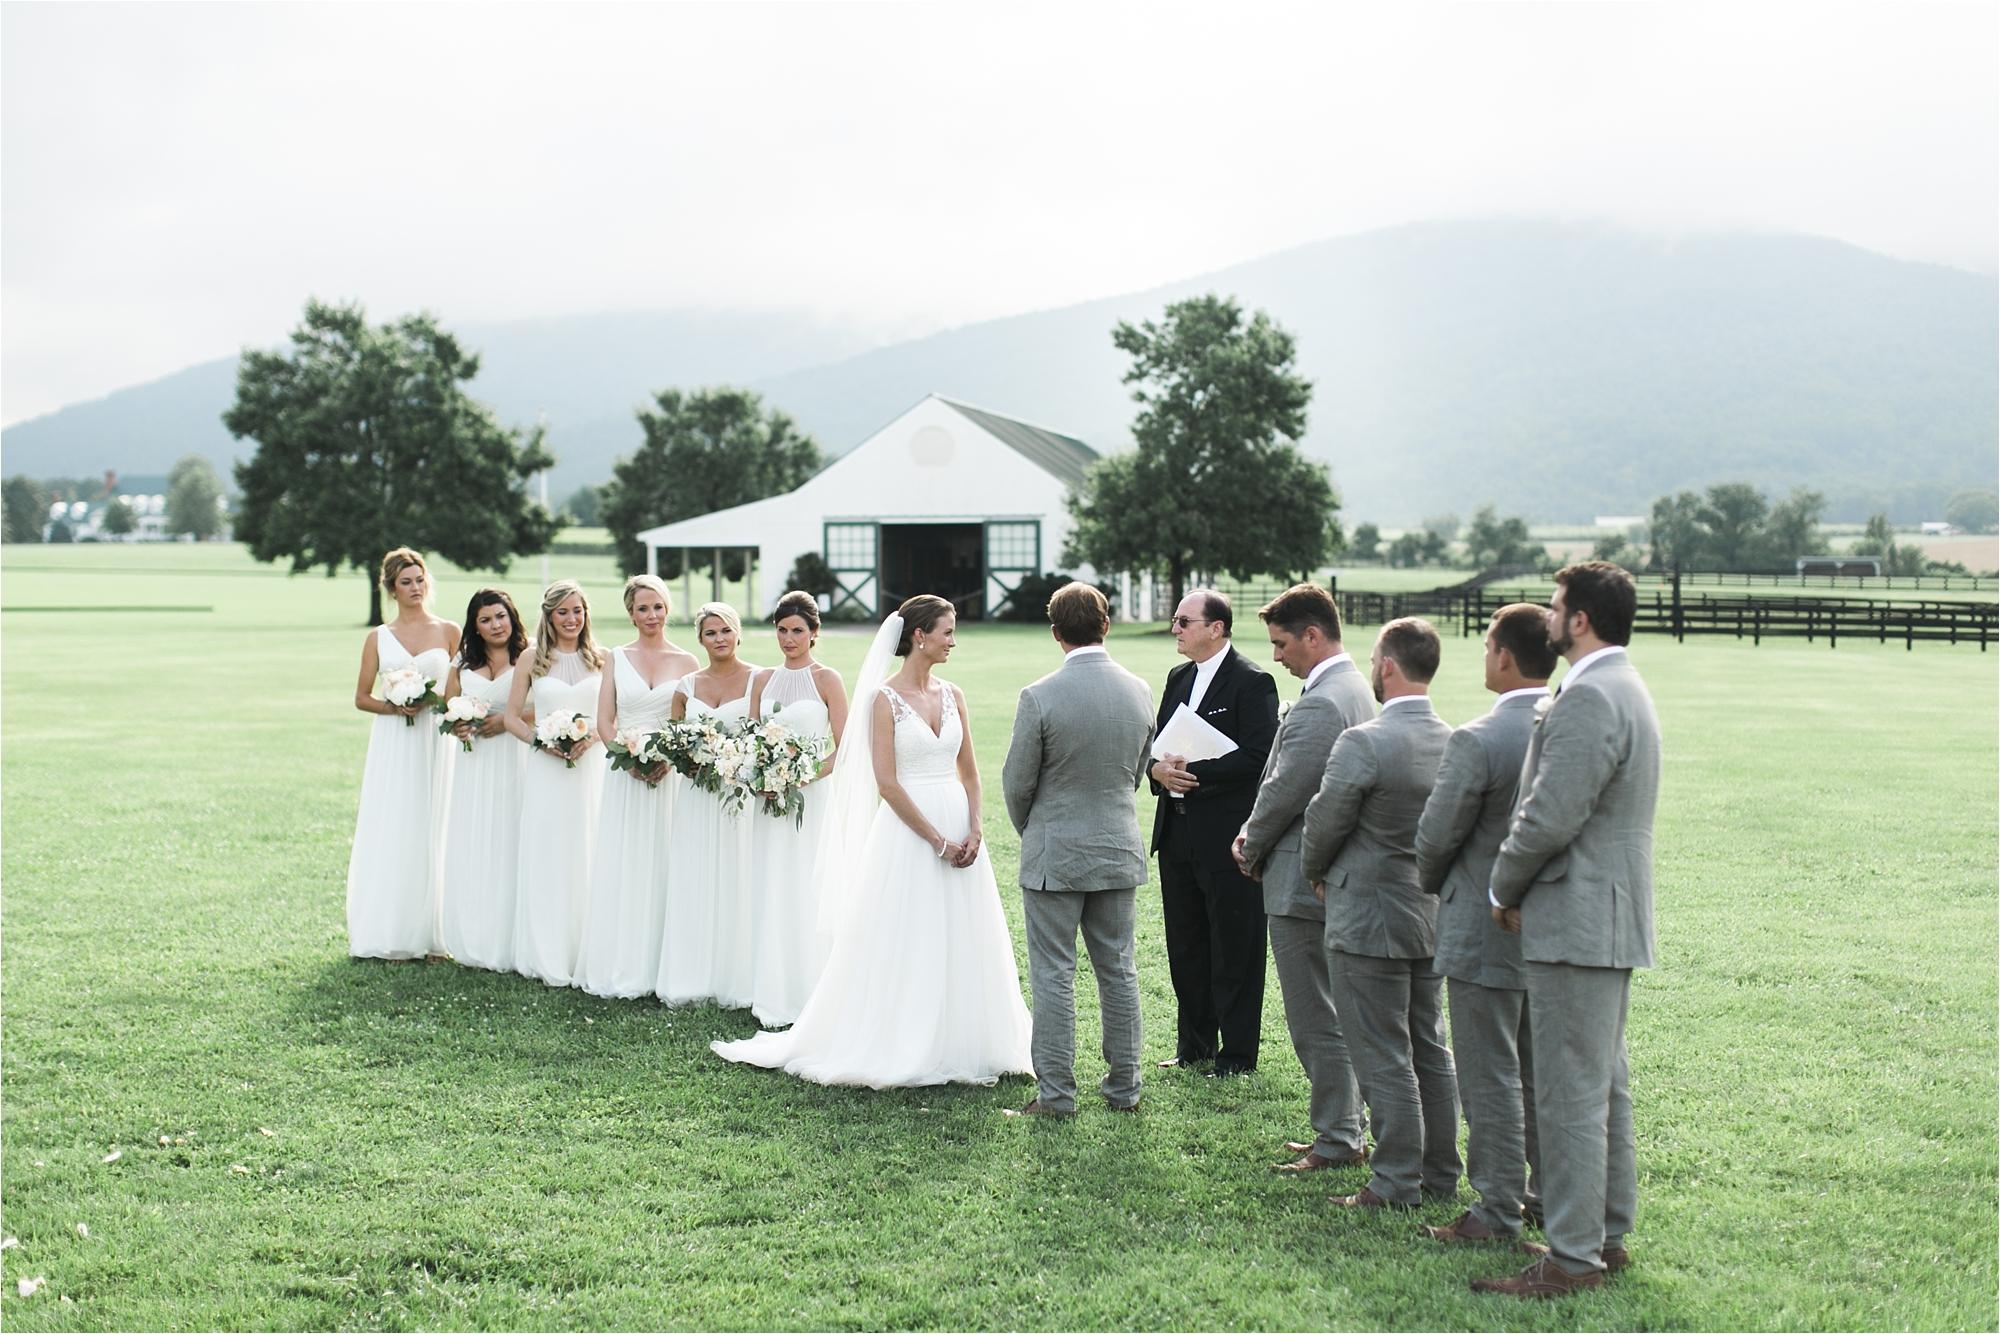 stephanie-yonce-charlottesville-virginia-king-family-vineyard-wedding-photos_0033.jpg